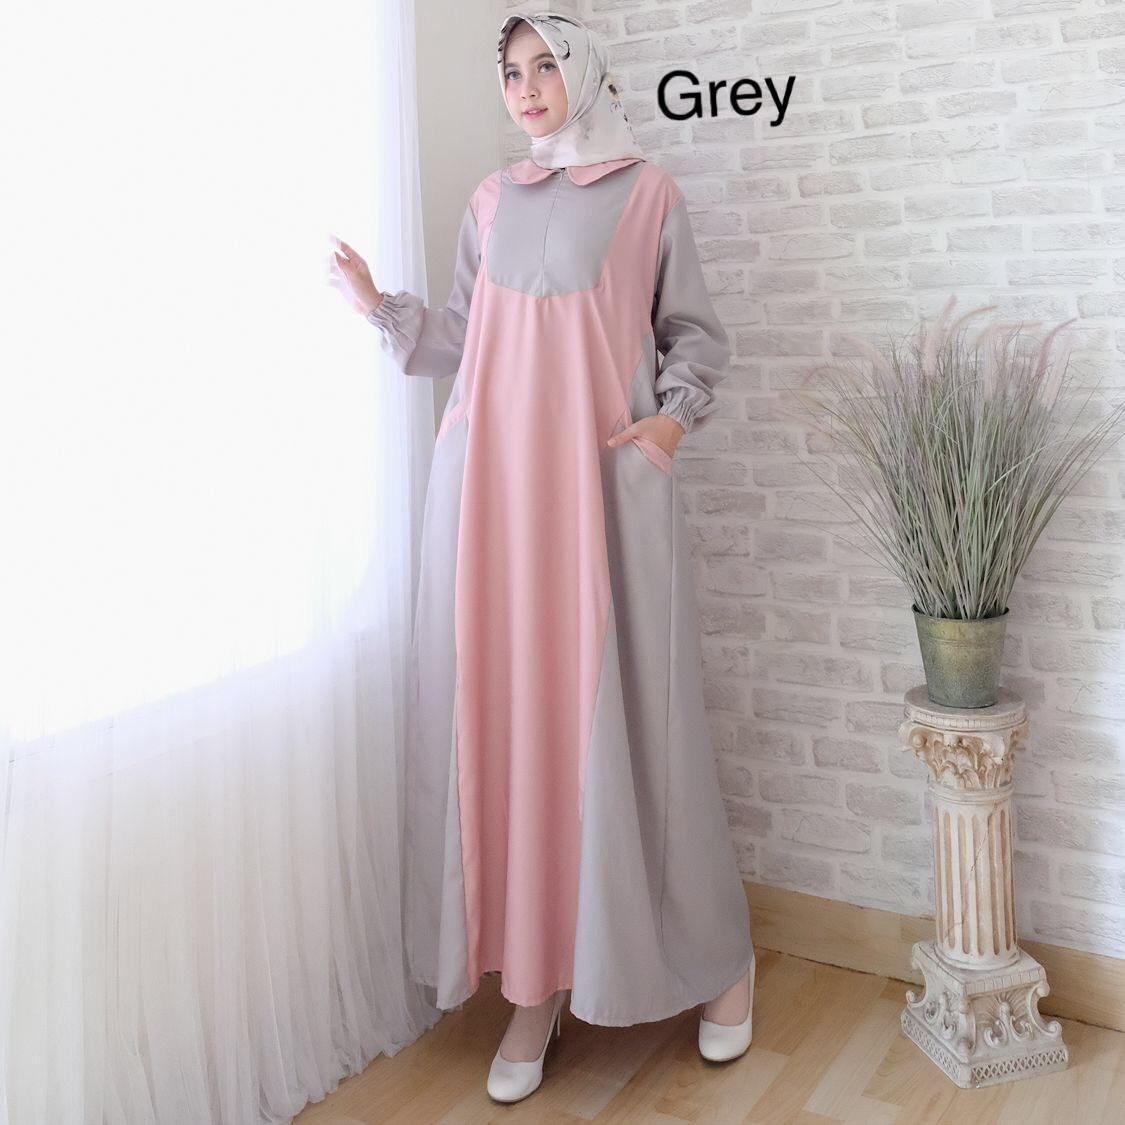 Alasxyashop Baju Gamis Muslim Jess / Dress Muslimah / Hijab Muslim / Gamis Syari'I / Baju Gamis / Fashion Muslim / Setelan Muslim / Hijab Wanita / Baju Muslim / Maxi Gamis / Fashion Muslim